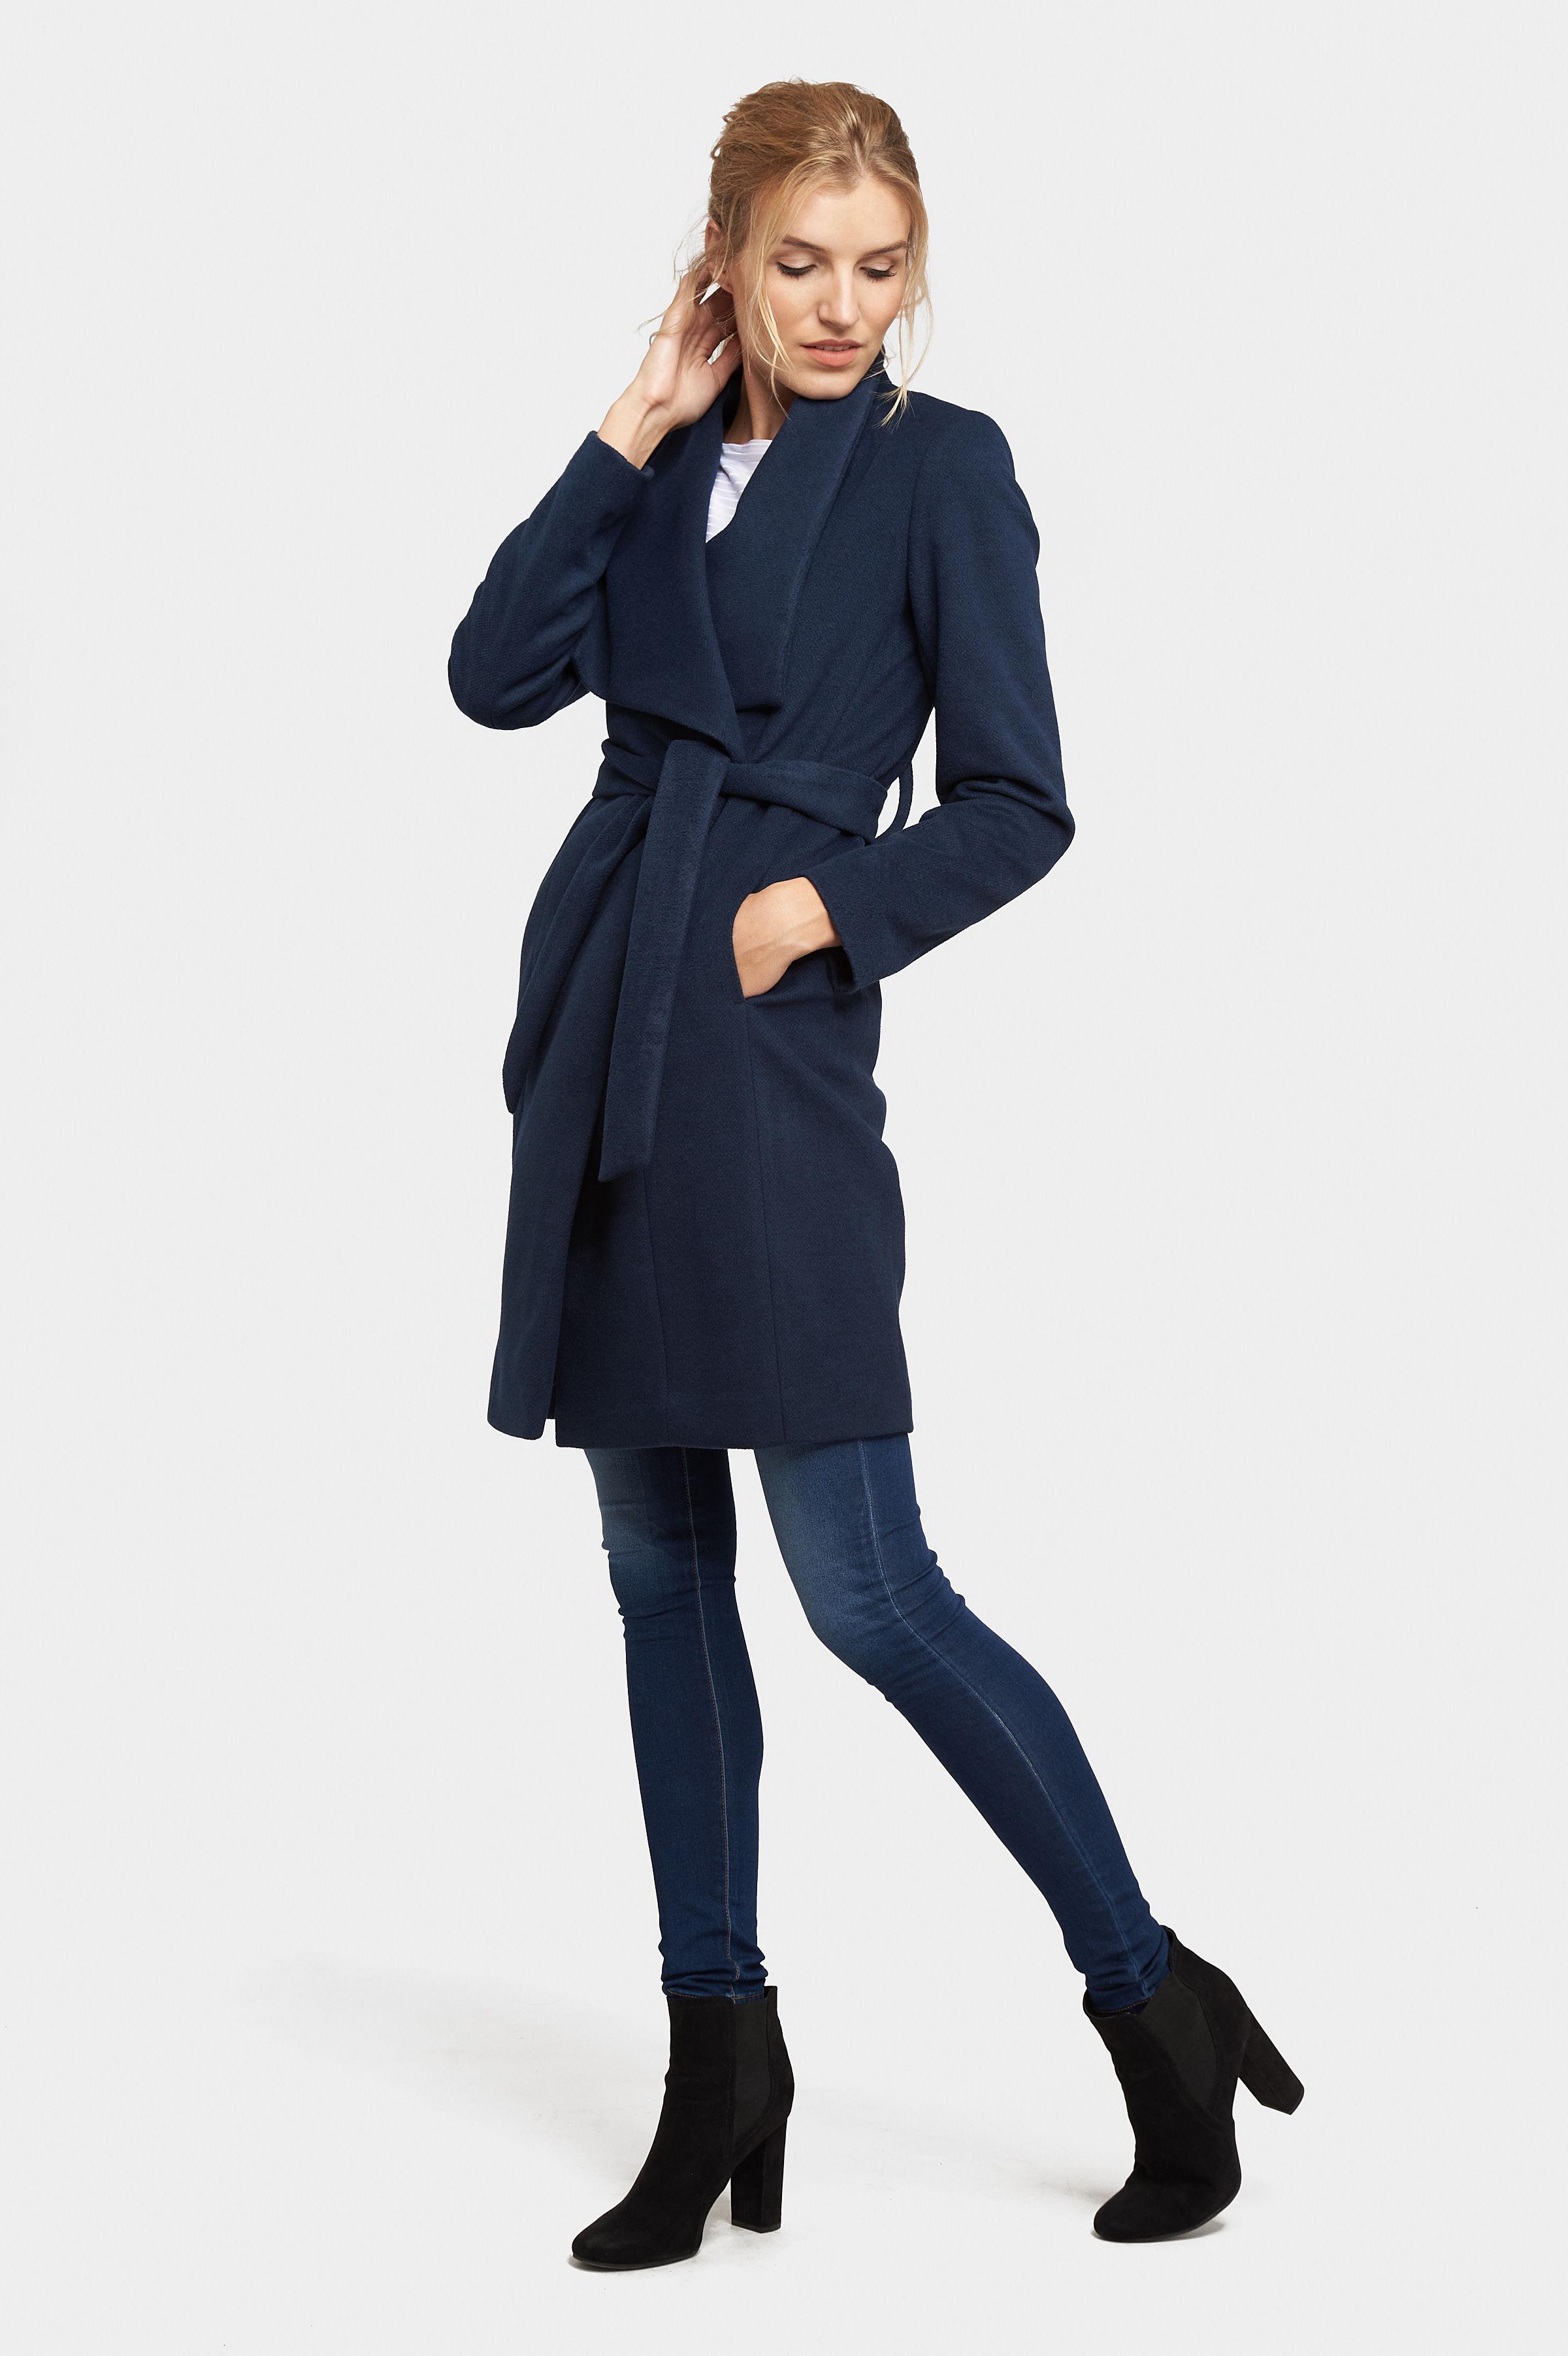 Kabát Lens - Kabáty - Jeseň zima 2018 - E-shop - Chantall.sk 23ca012ba1